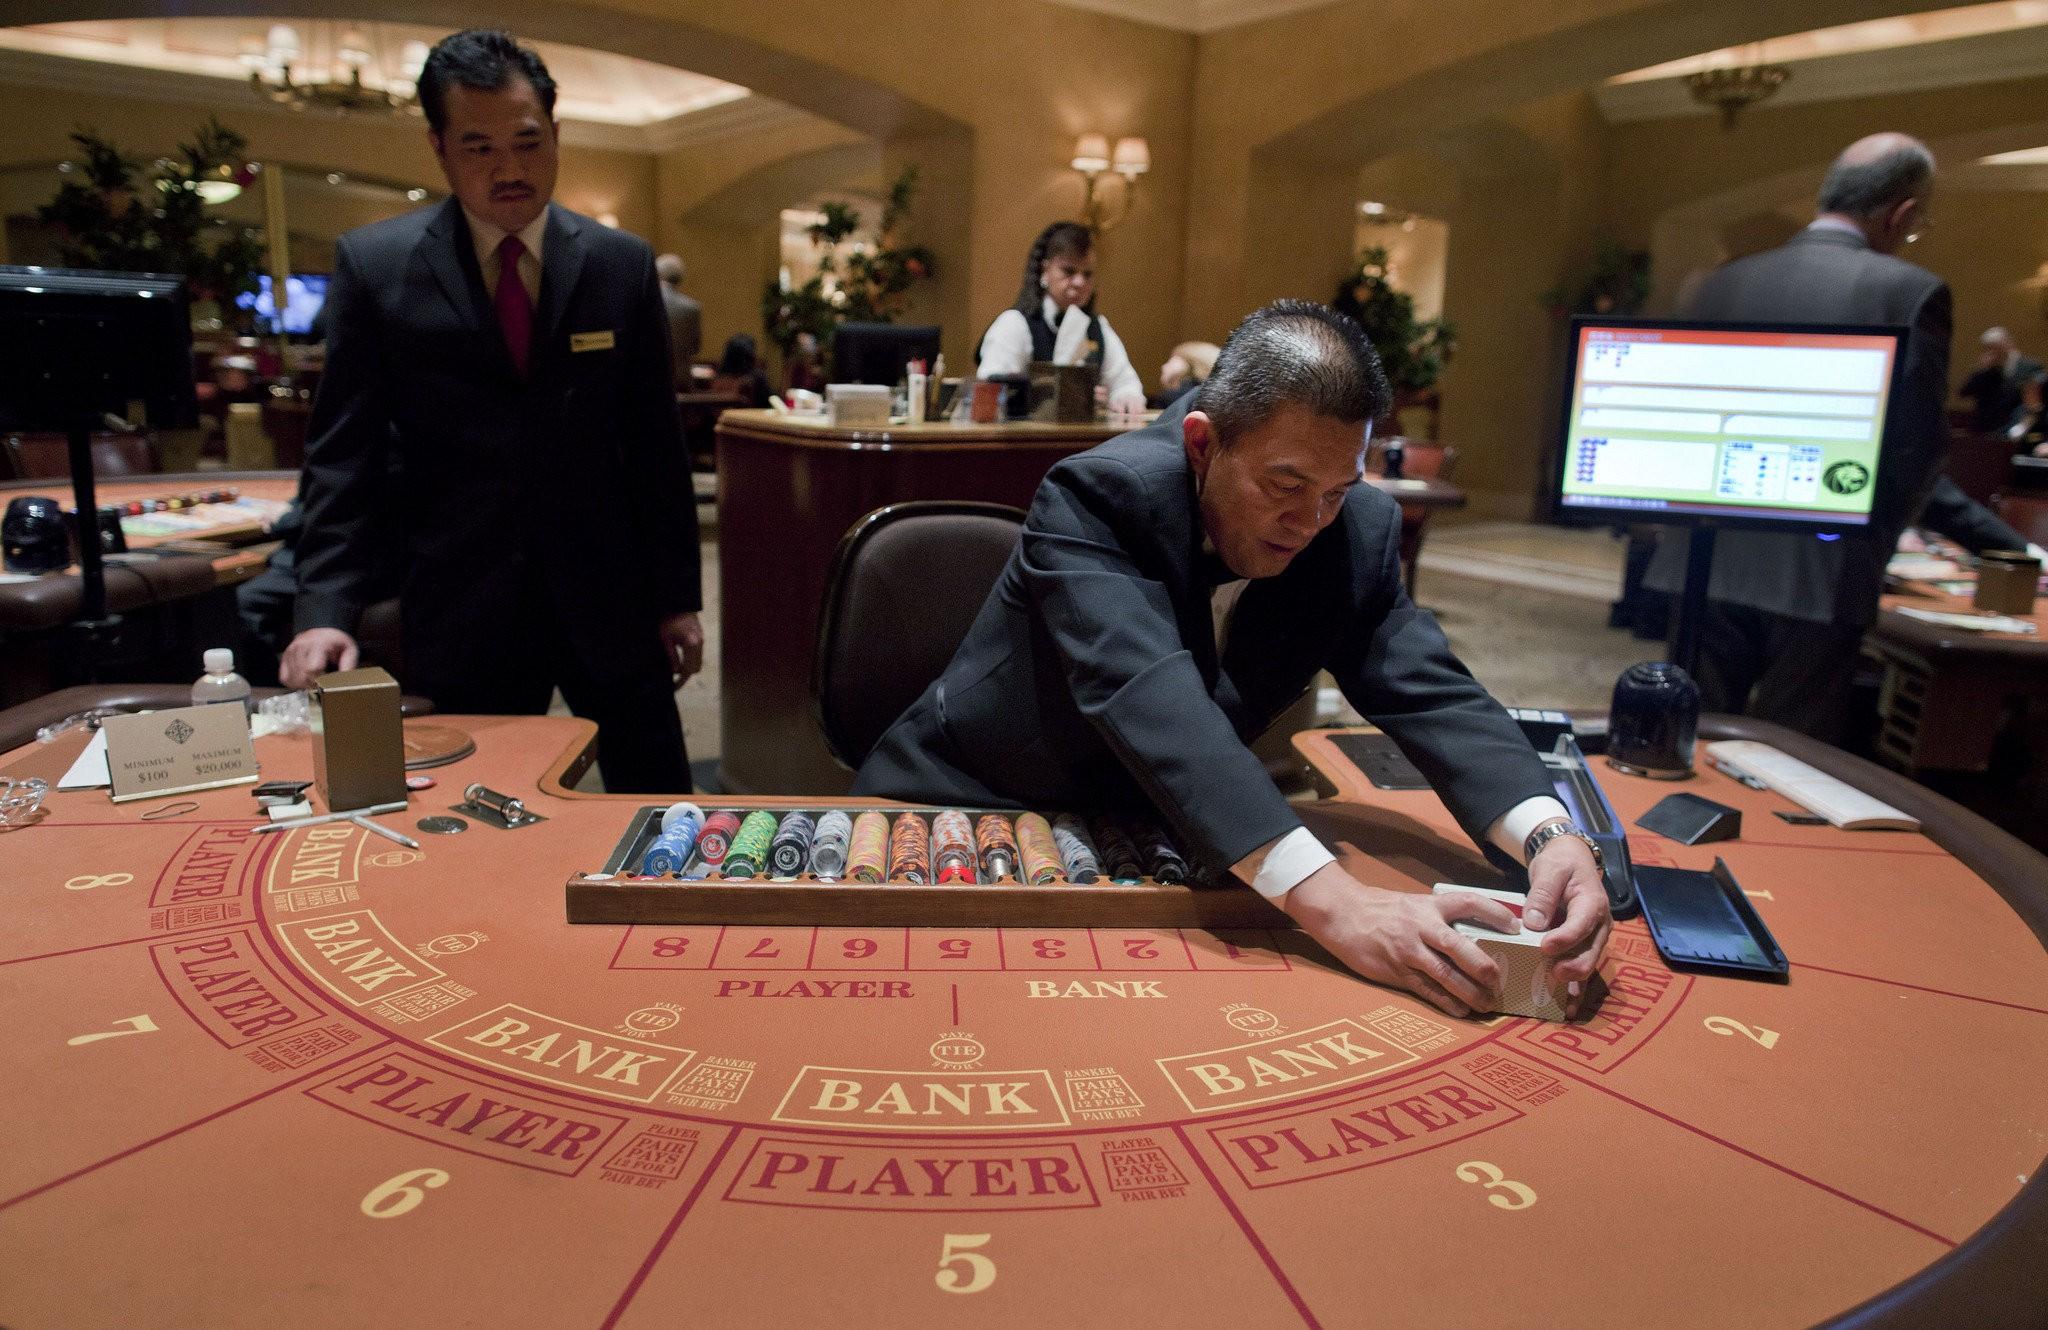 Las Vegas Casinos Relying More On Baccarat Masslive Com